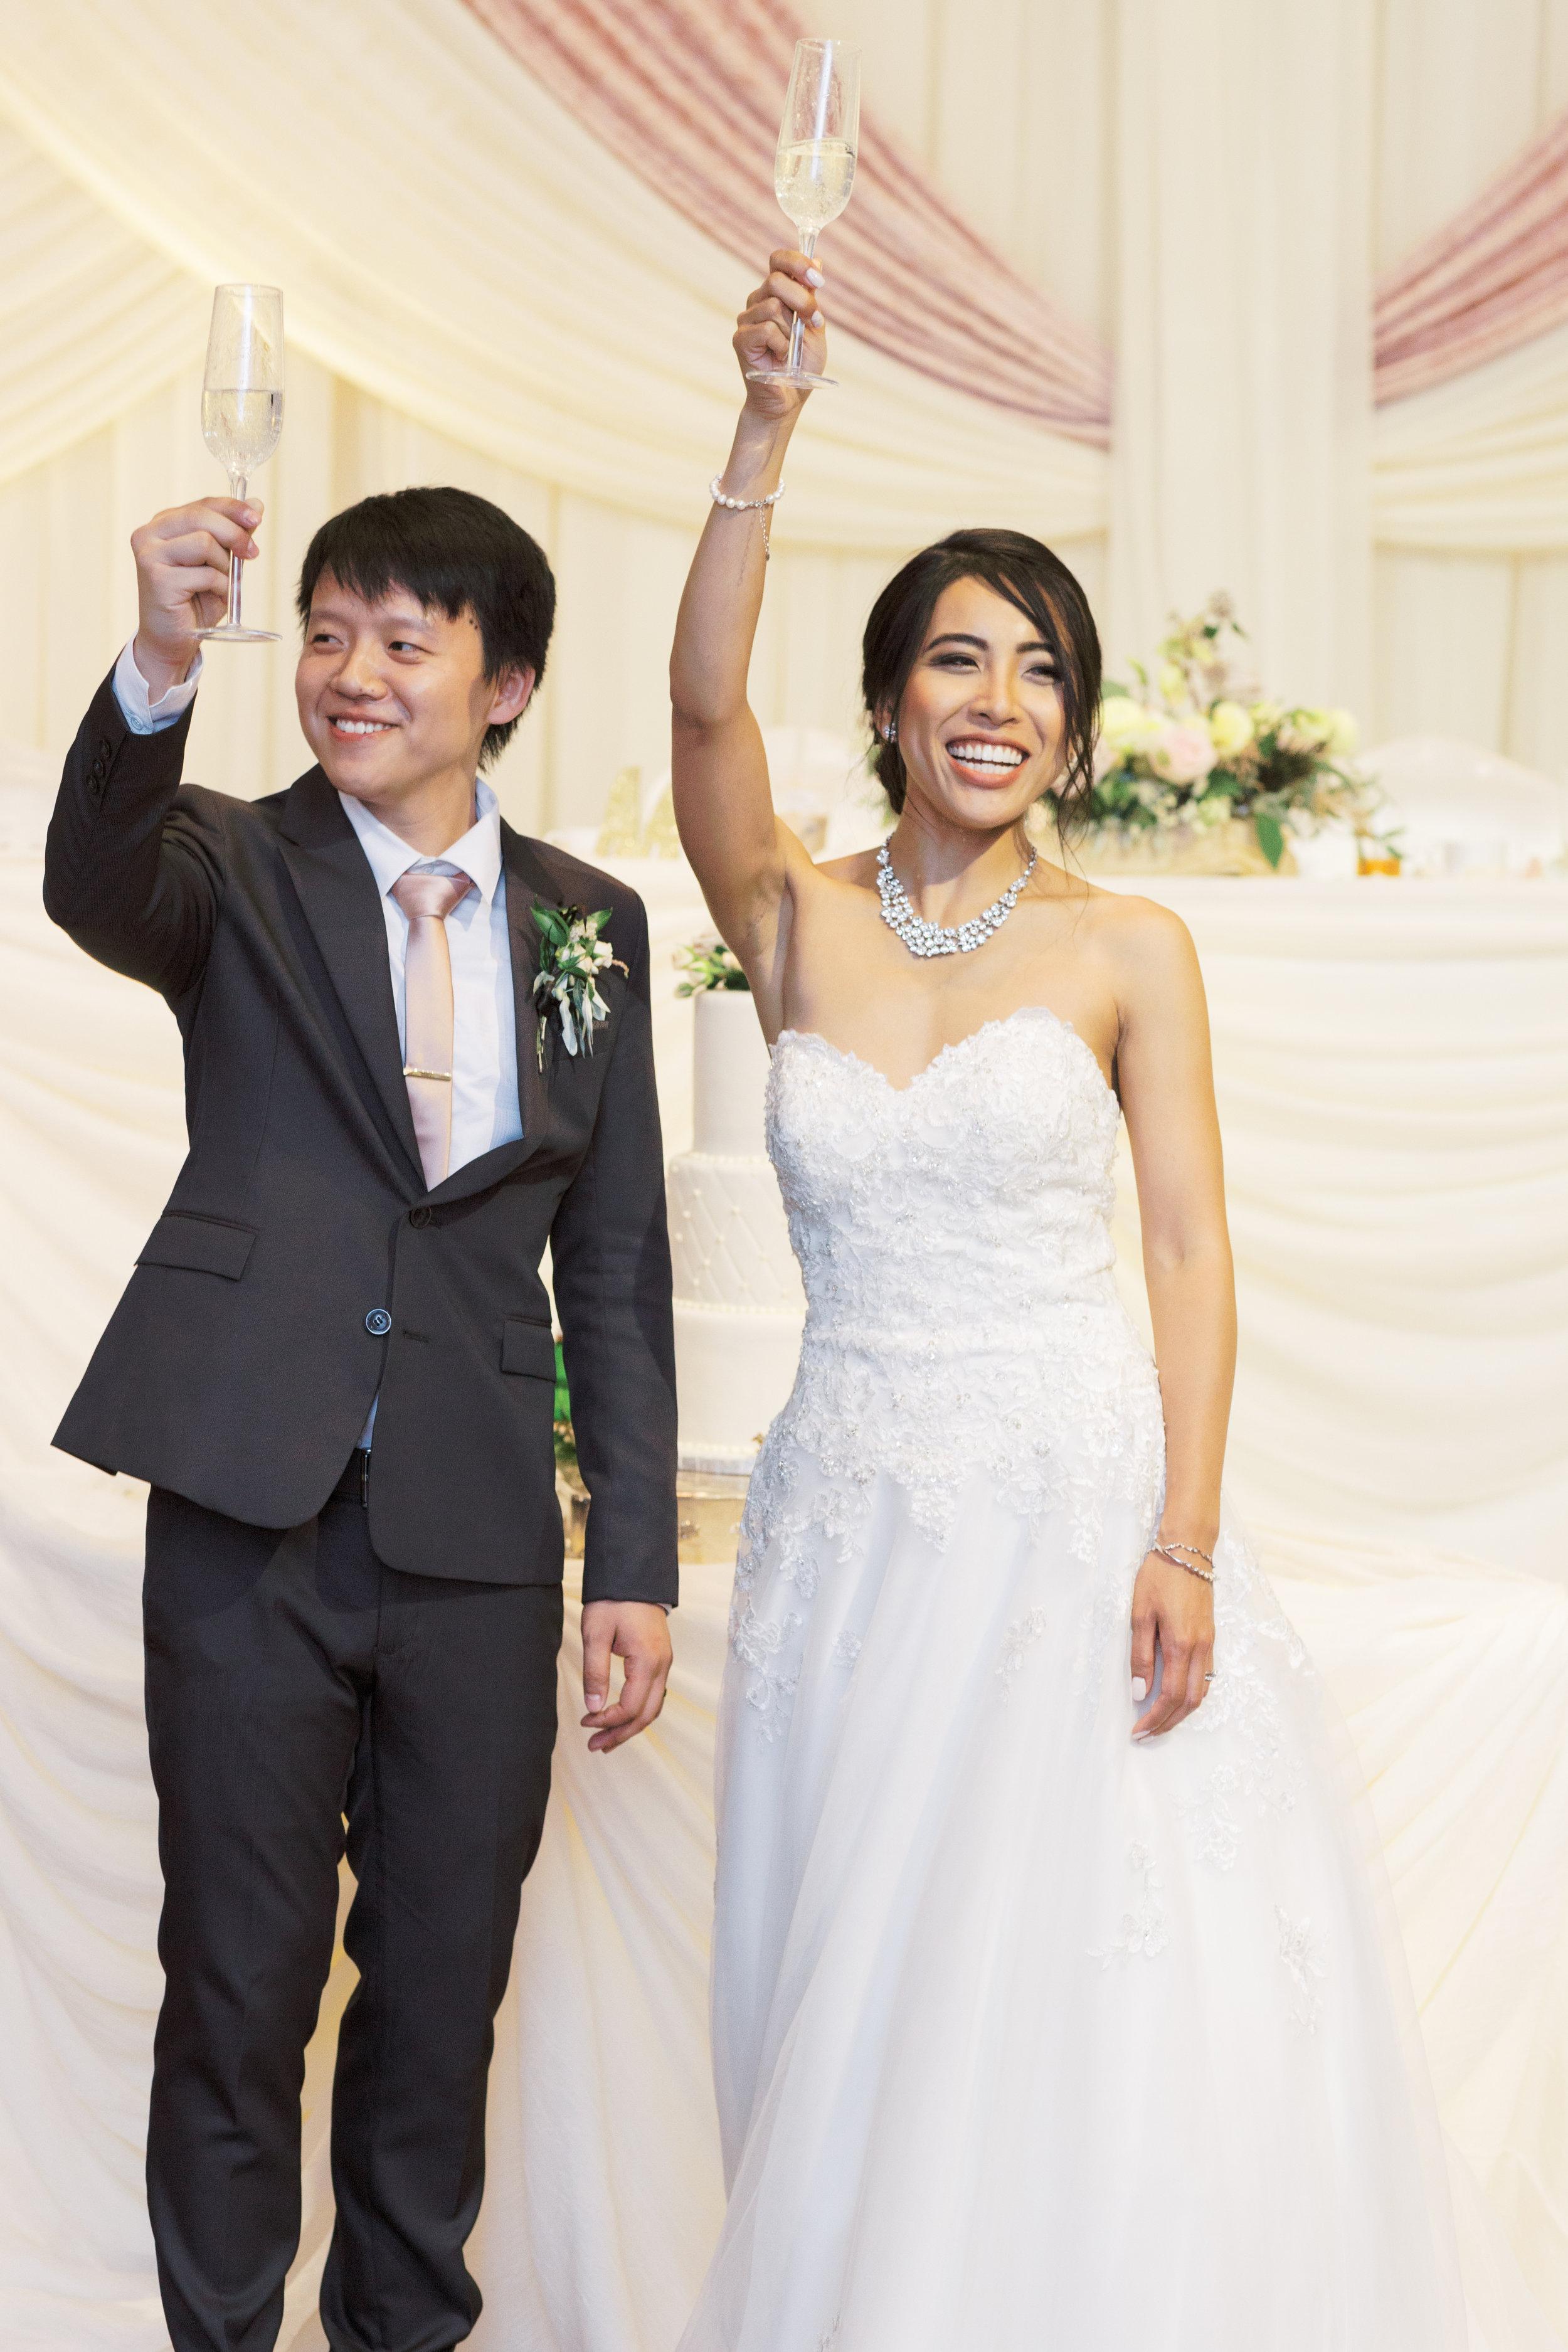 Markham Event Center Wedding-Reception-78.jpg